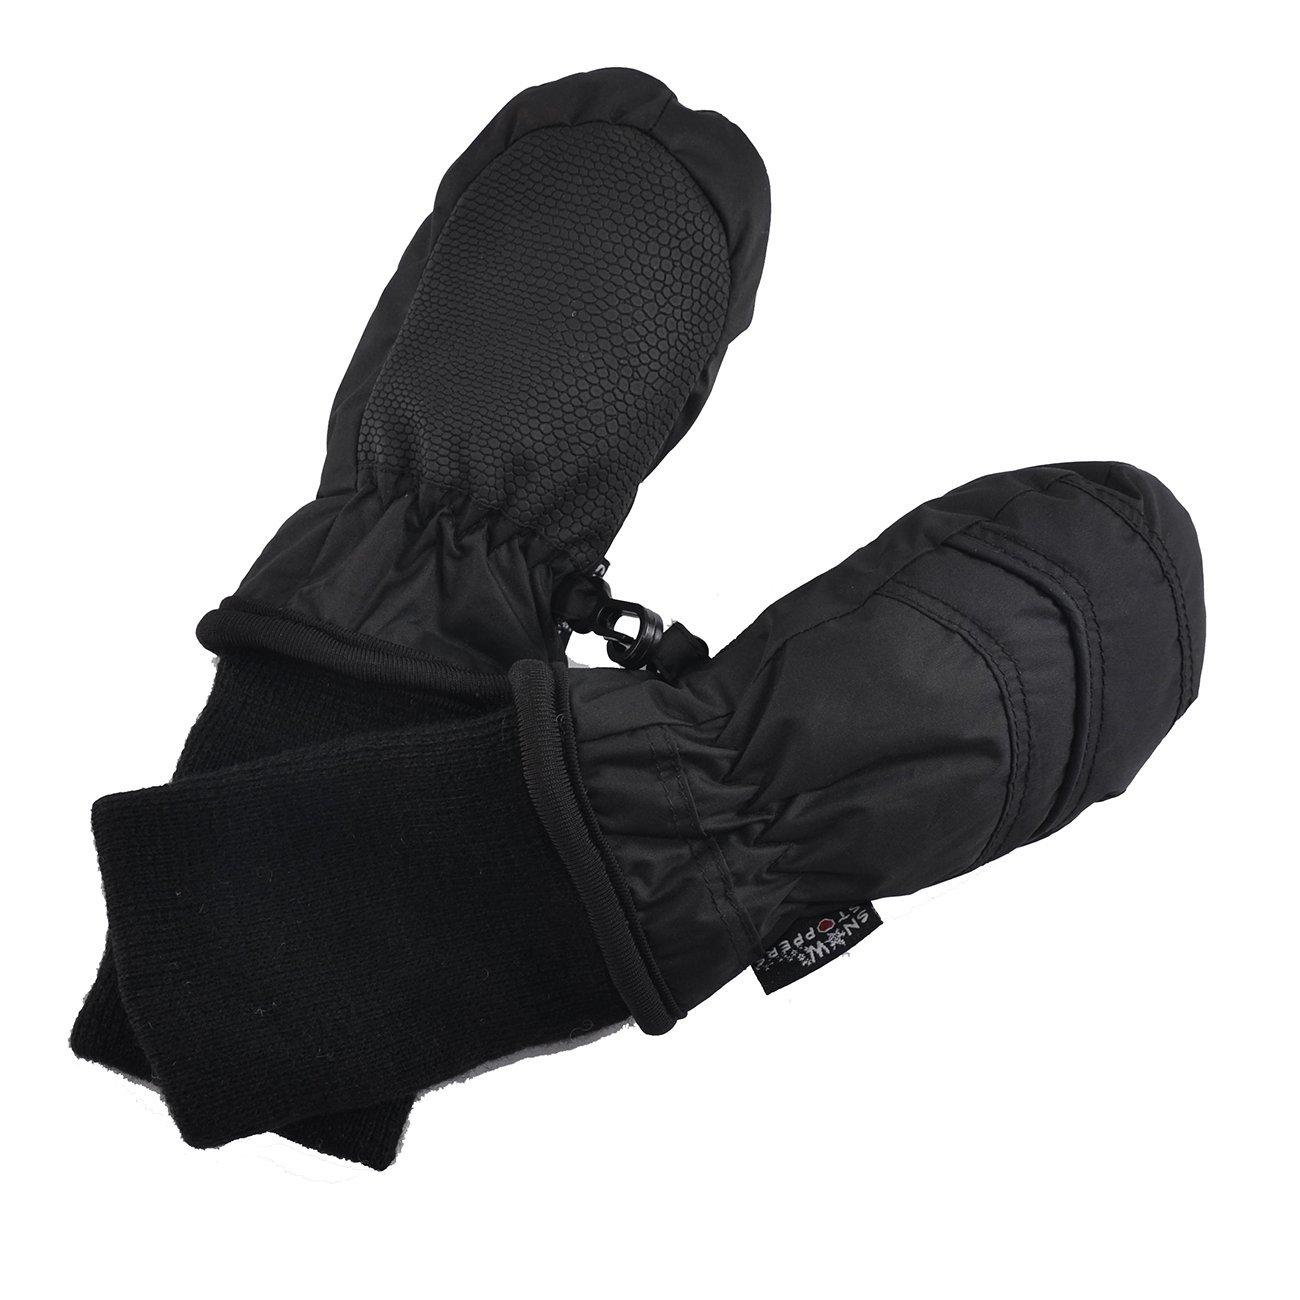 Kids Nylon Waterproof Mittens in Black